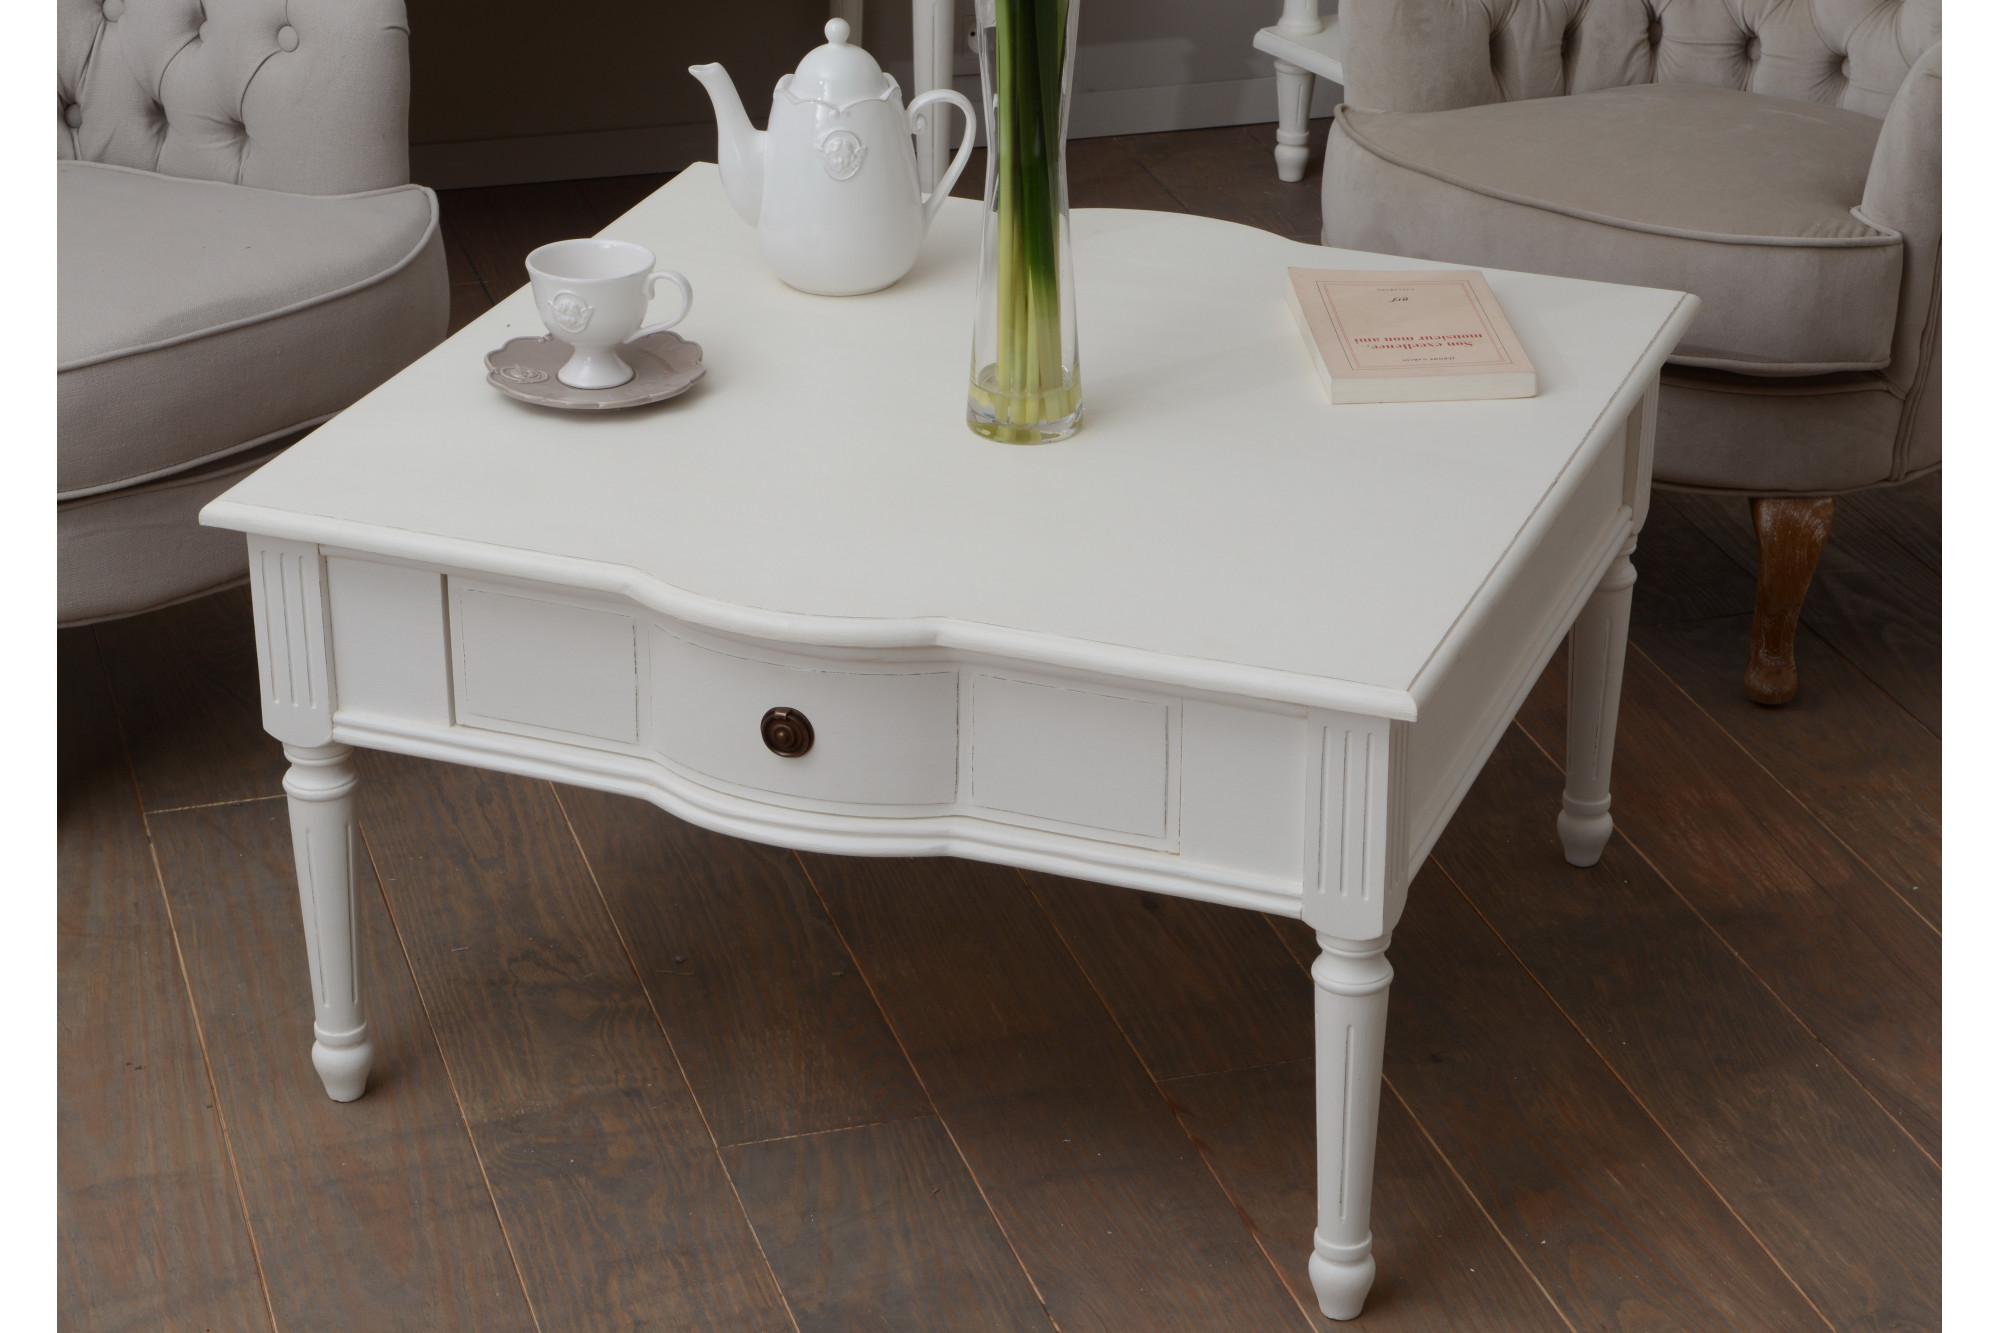 Table Basse Carree Romantique En Bois Hellin